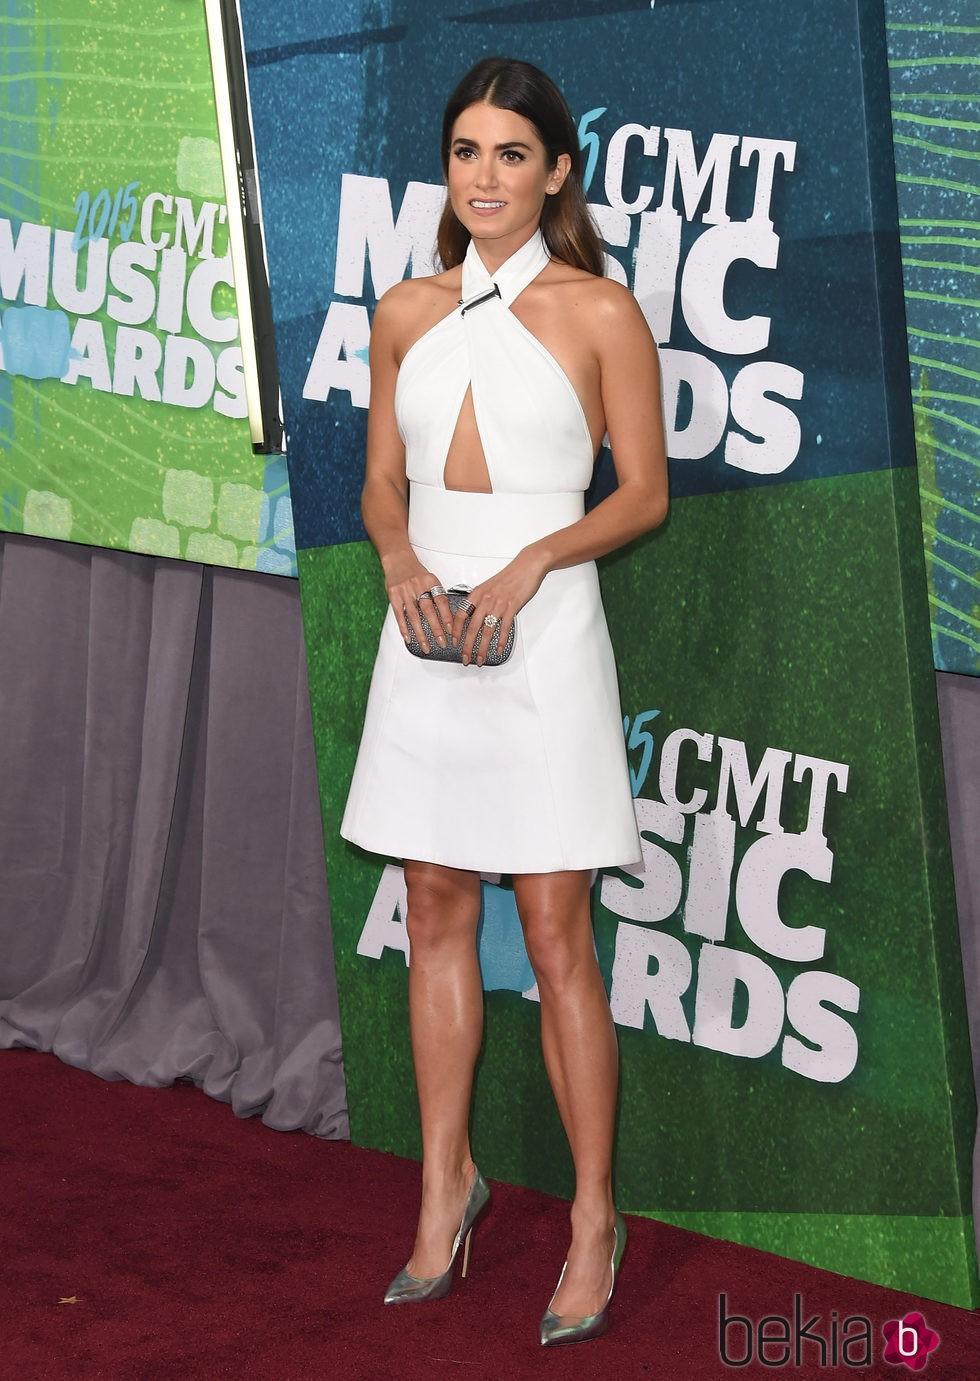 Nikki Reed en los CMT Music Awards 2015